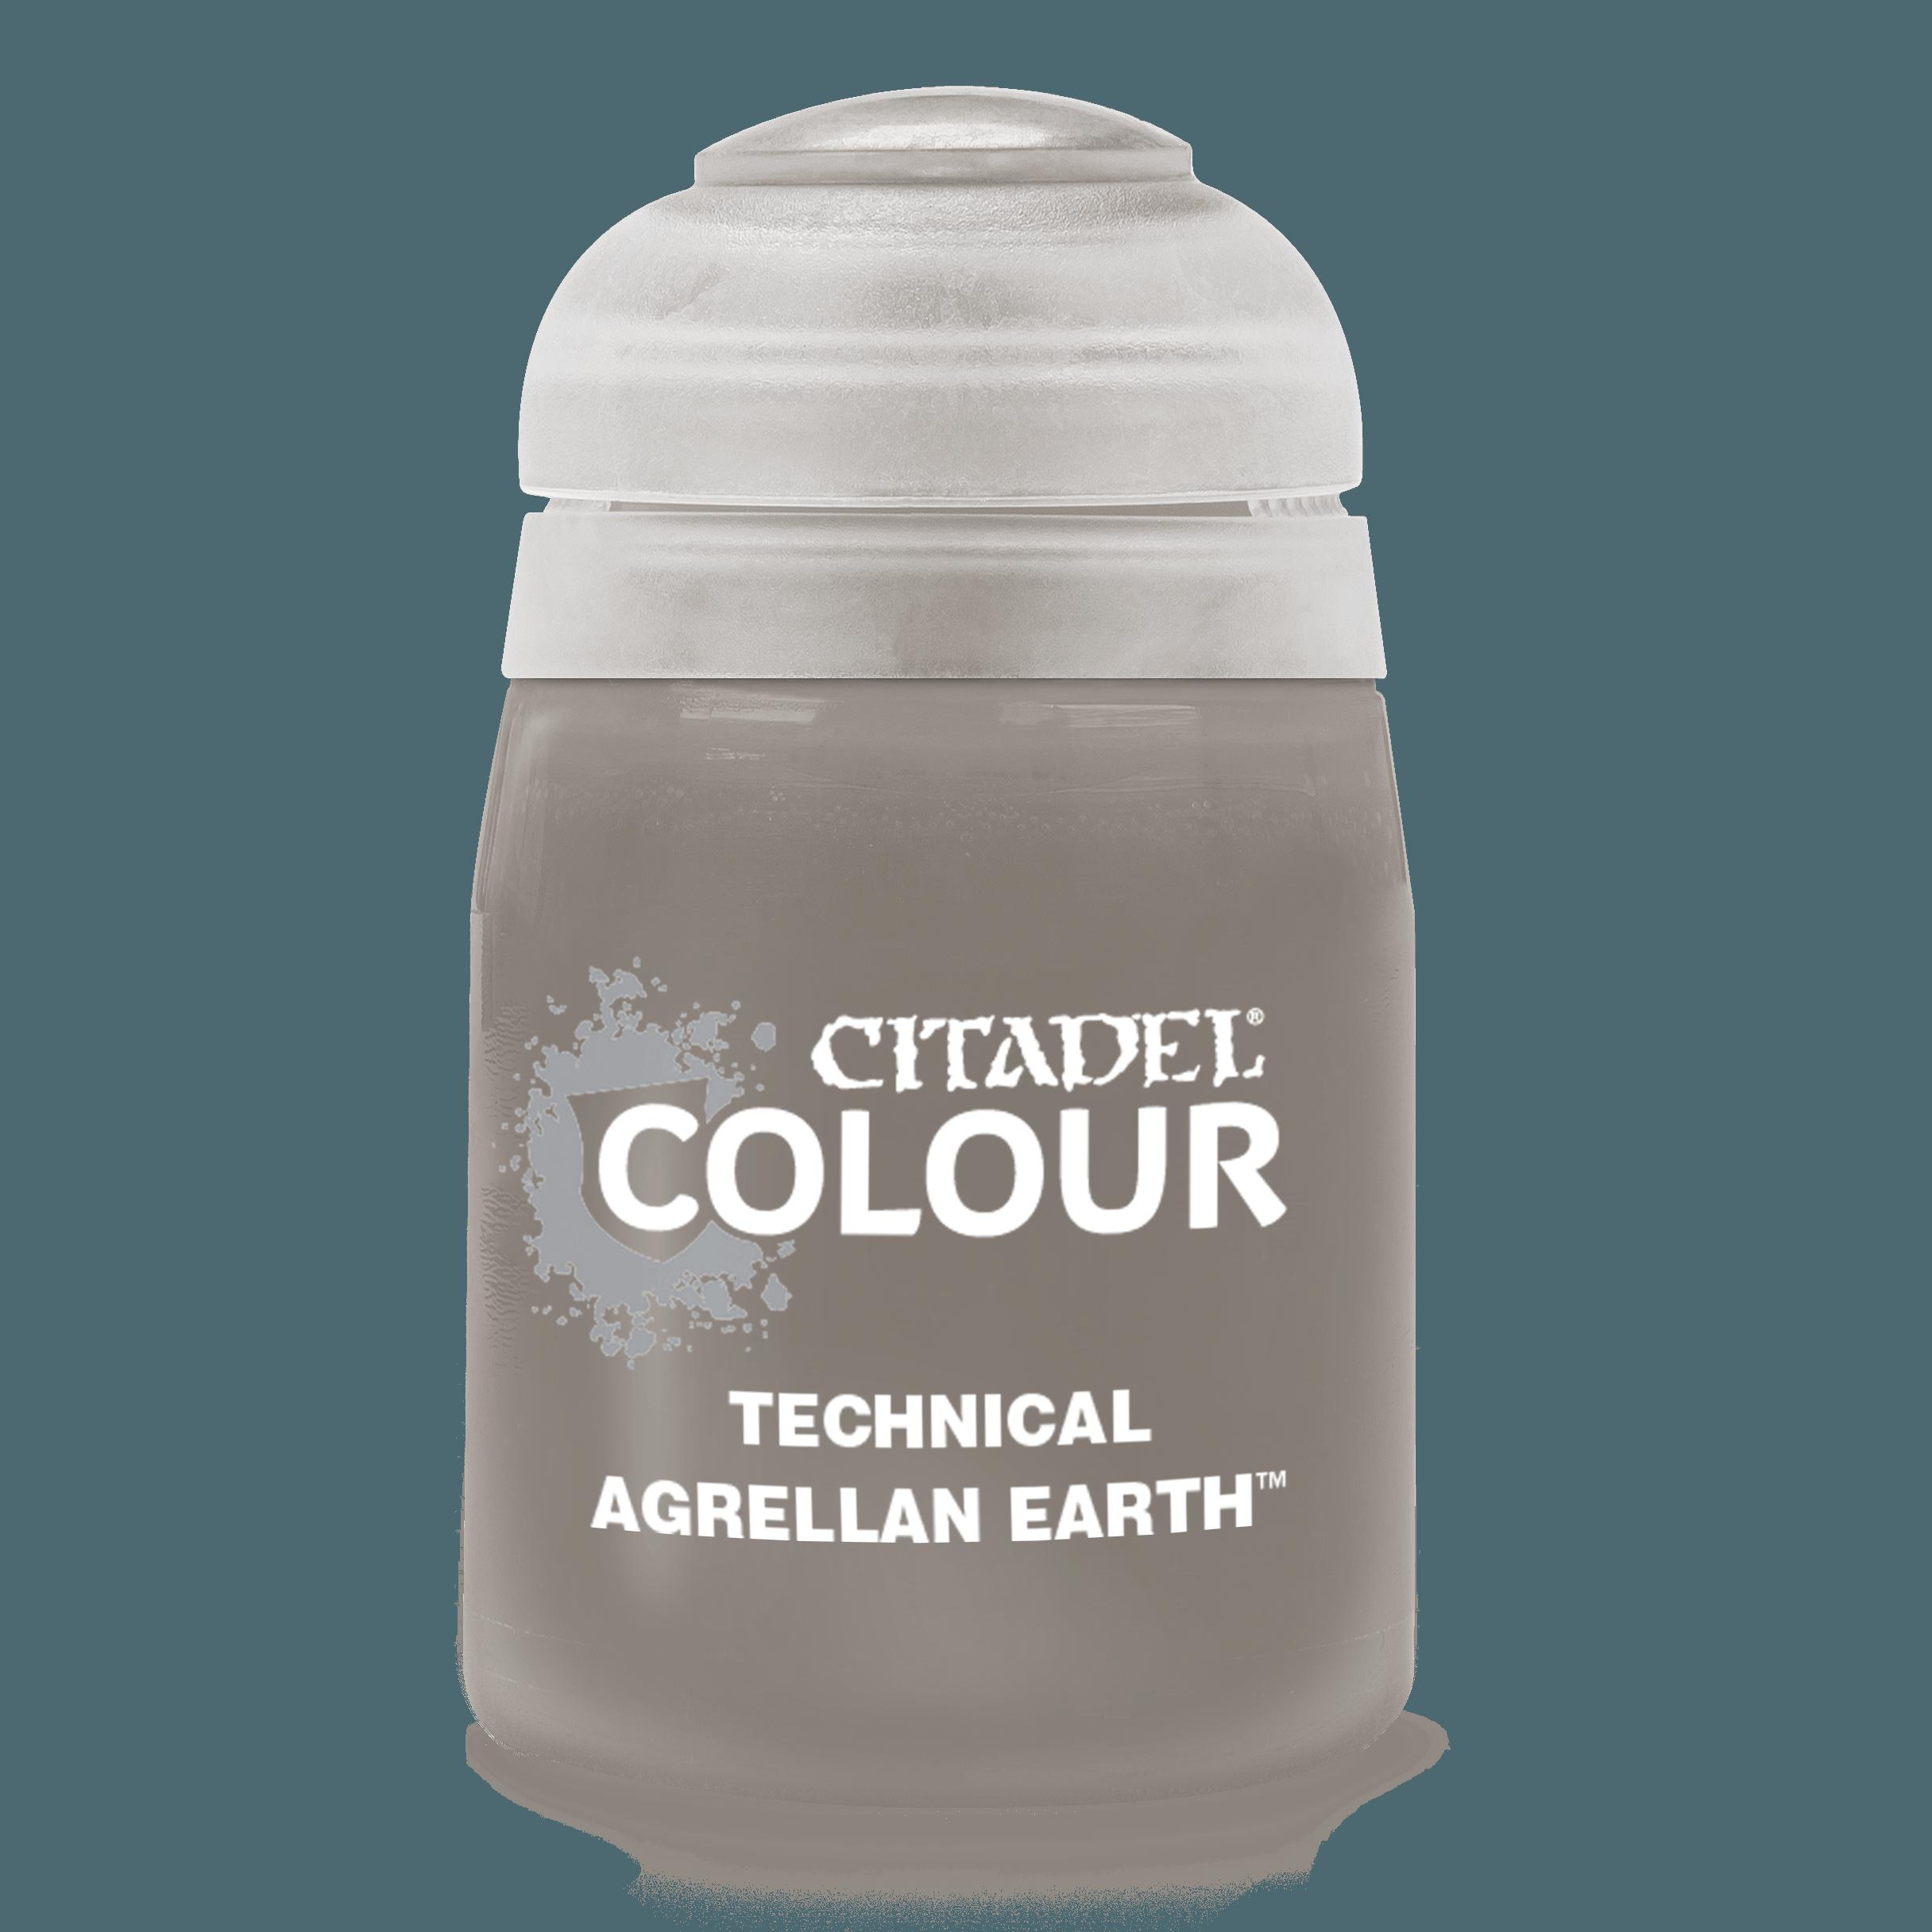 27-22 Technical Agrellan Earth 24ml